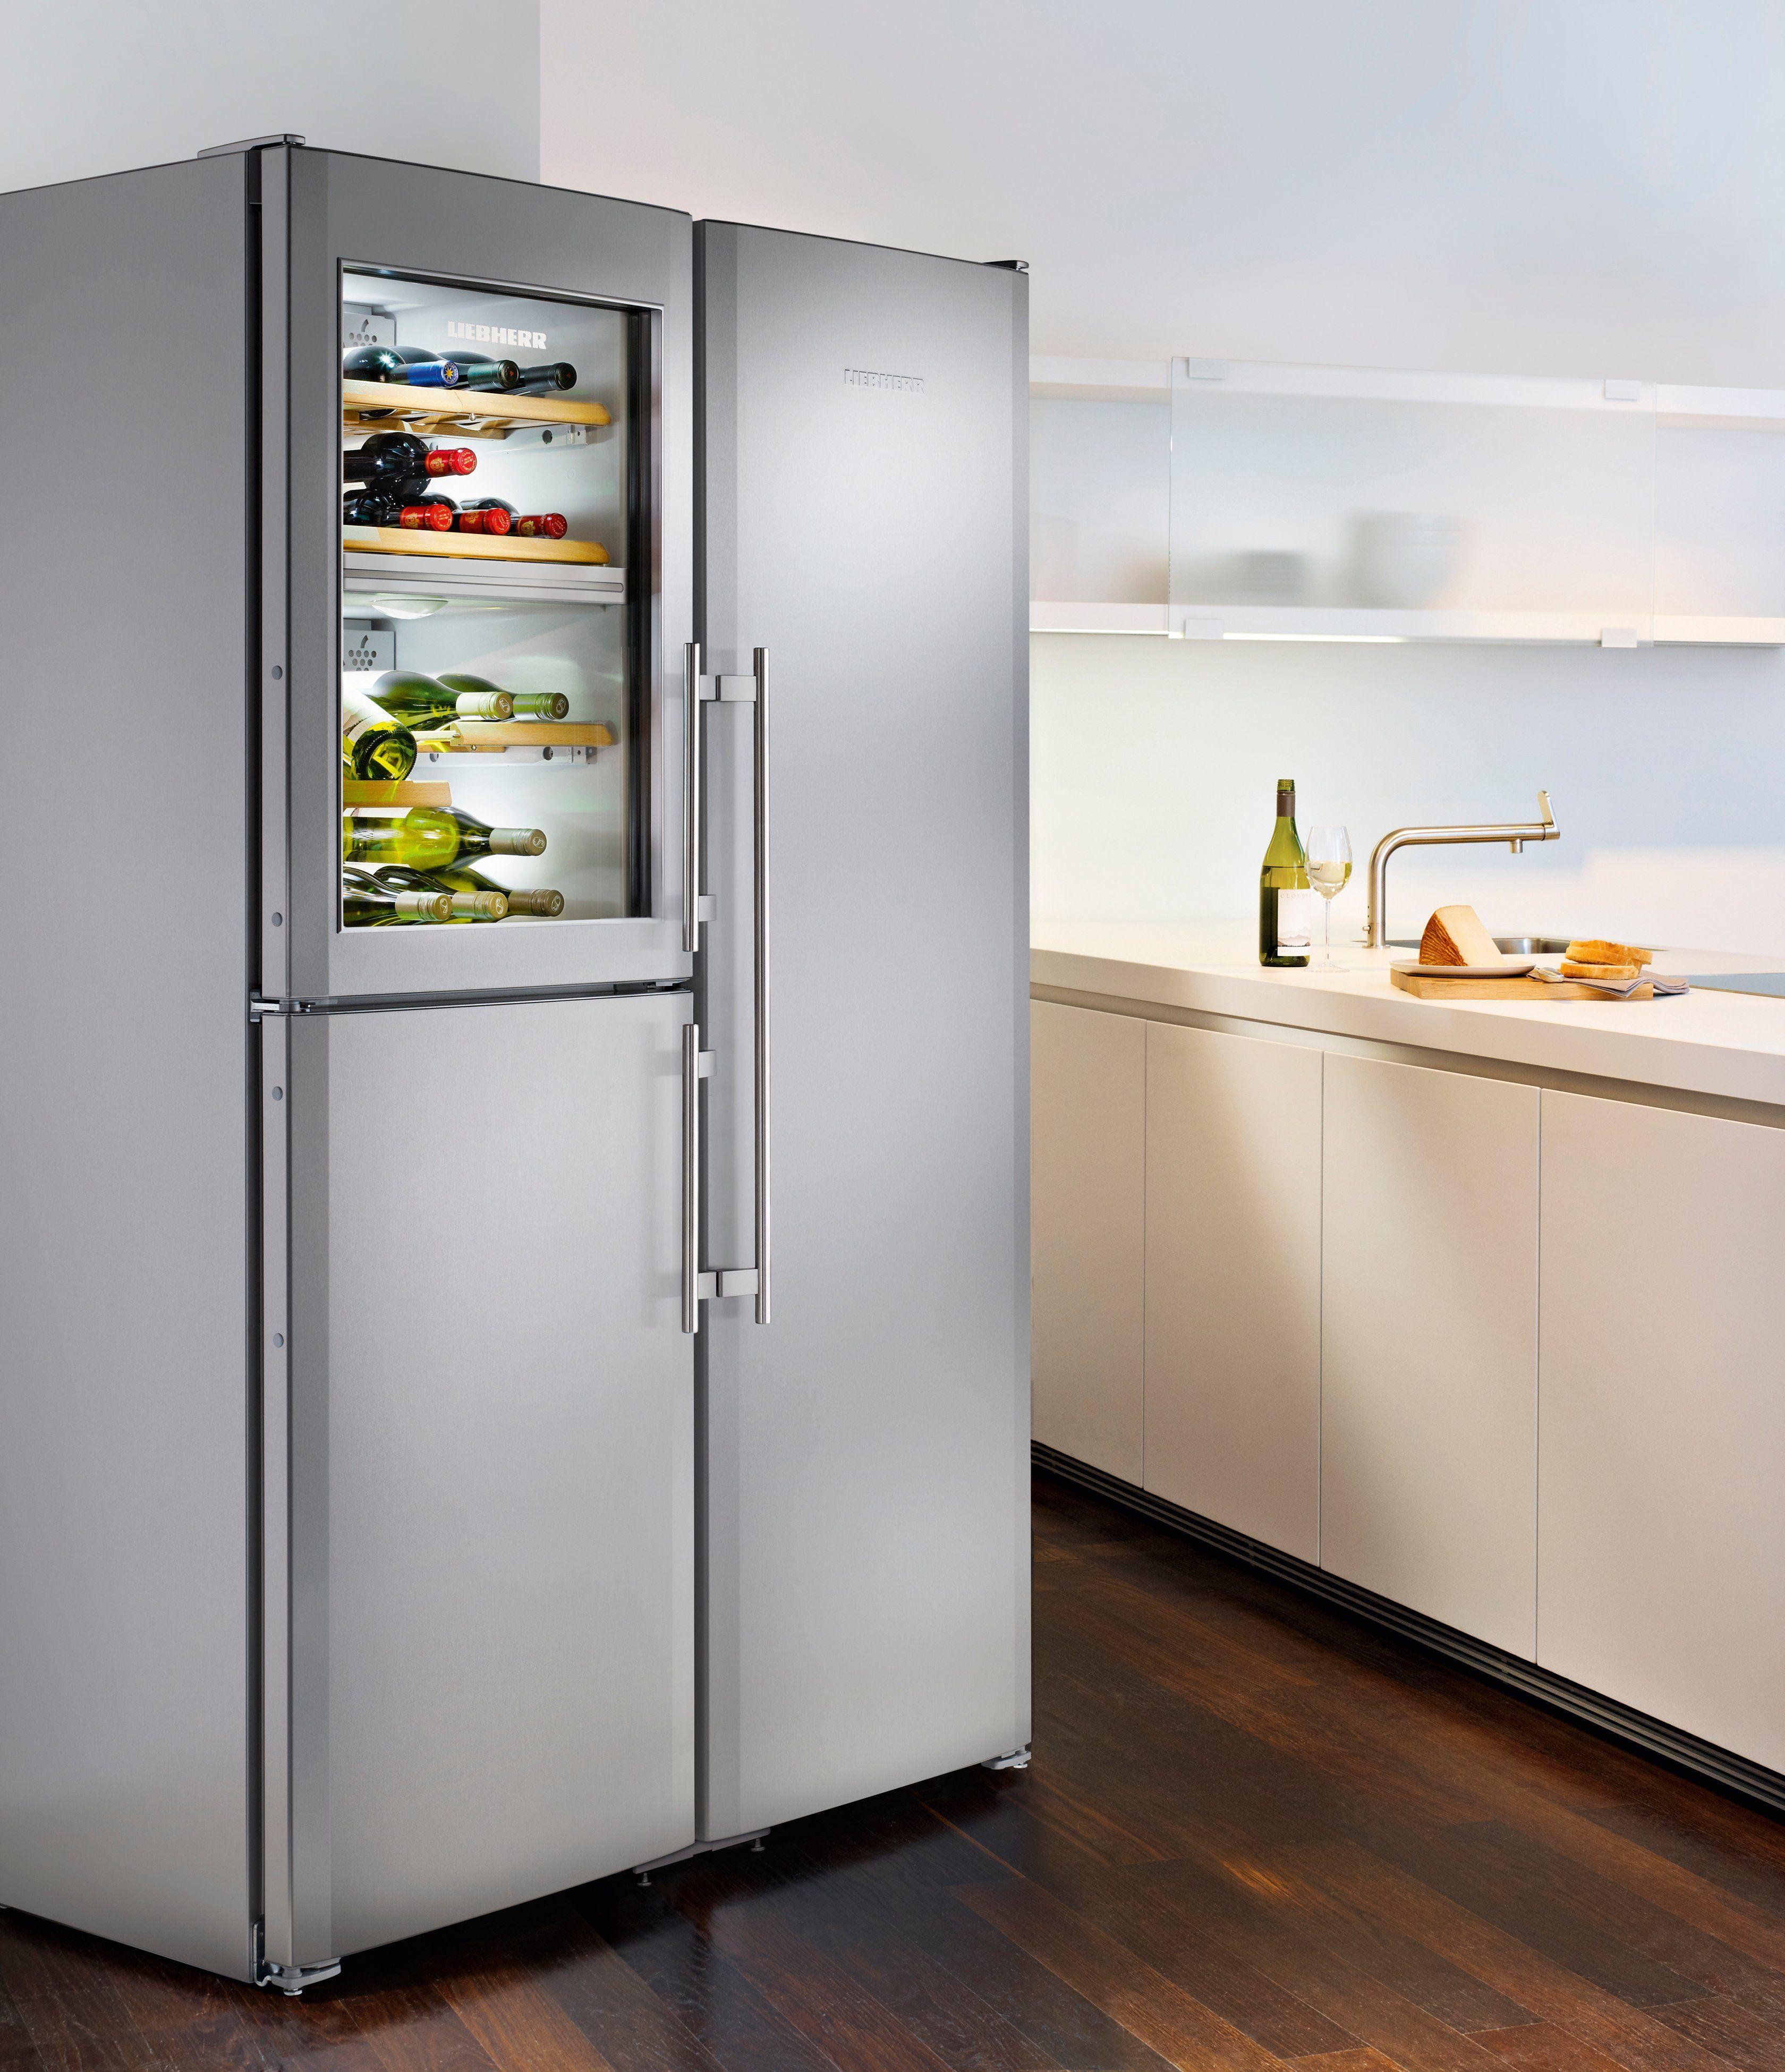 E442blxfd4 Activesmart Fridge 680mm Bottom Freezer 396l 24334 Steel Fridge Stainless Steel Fridge Freezer